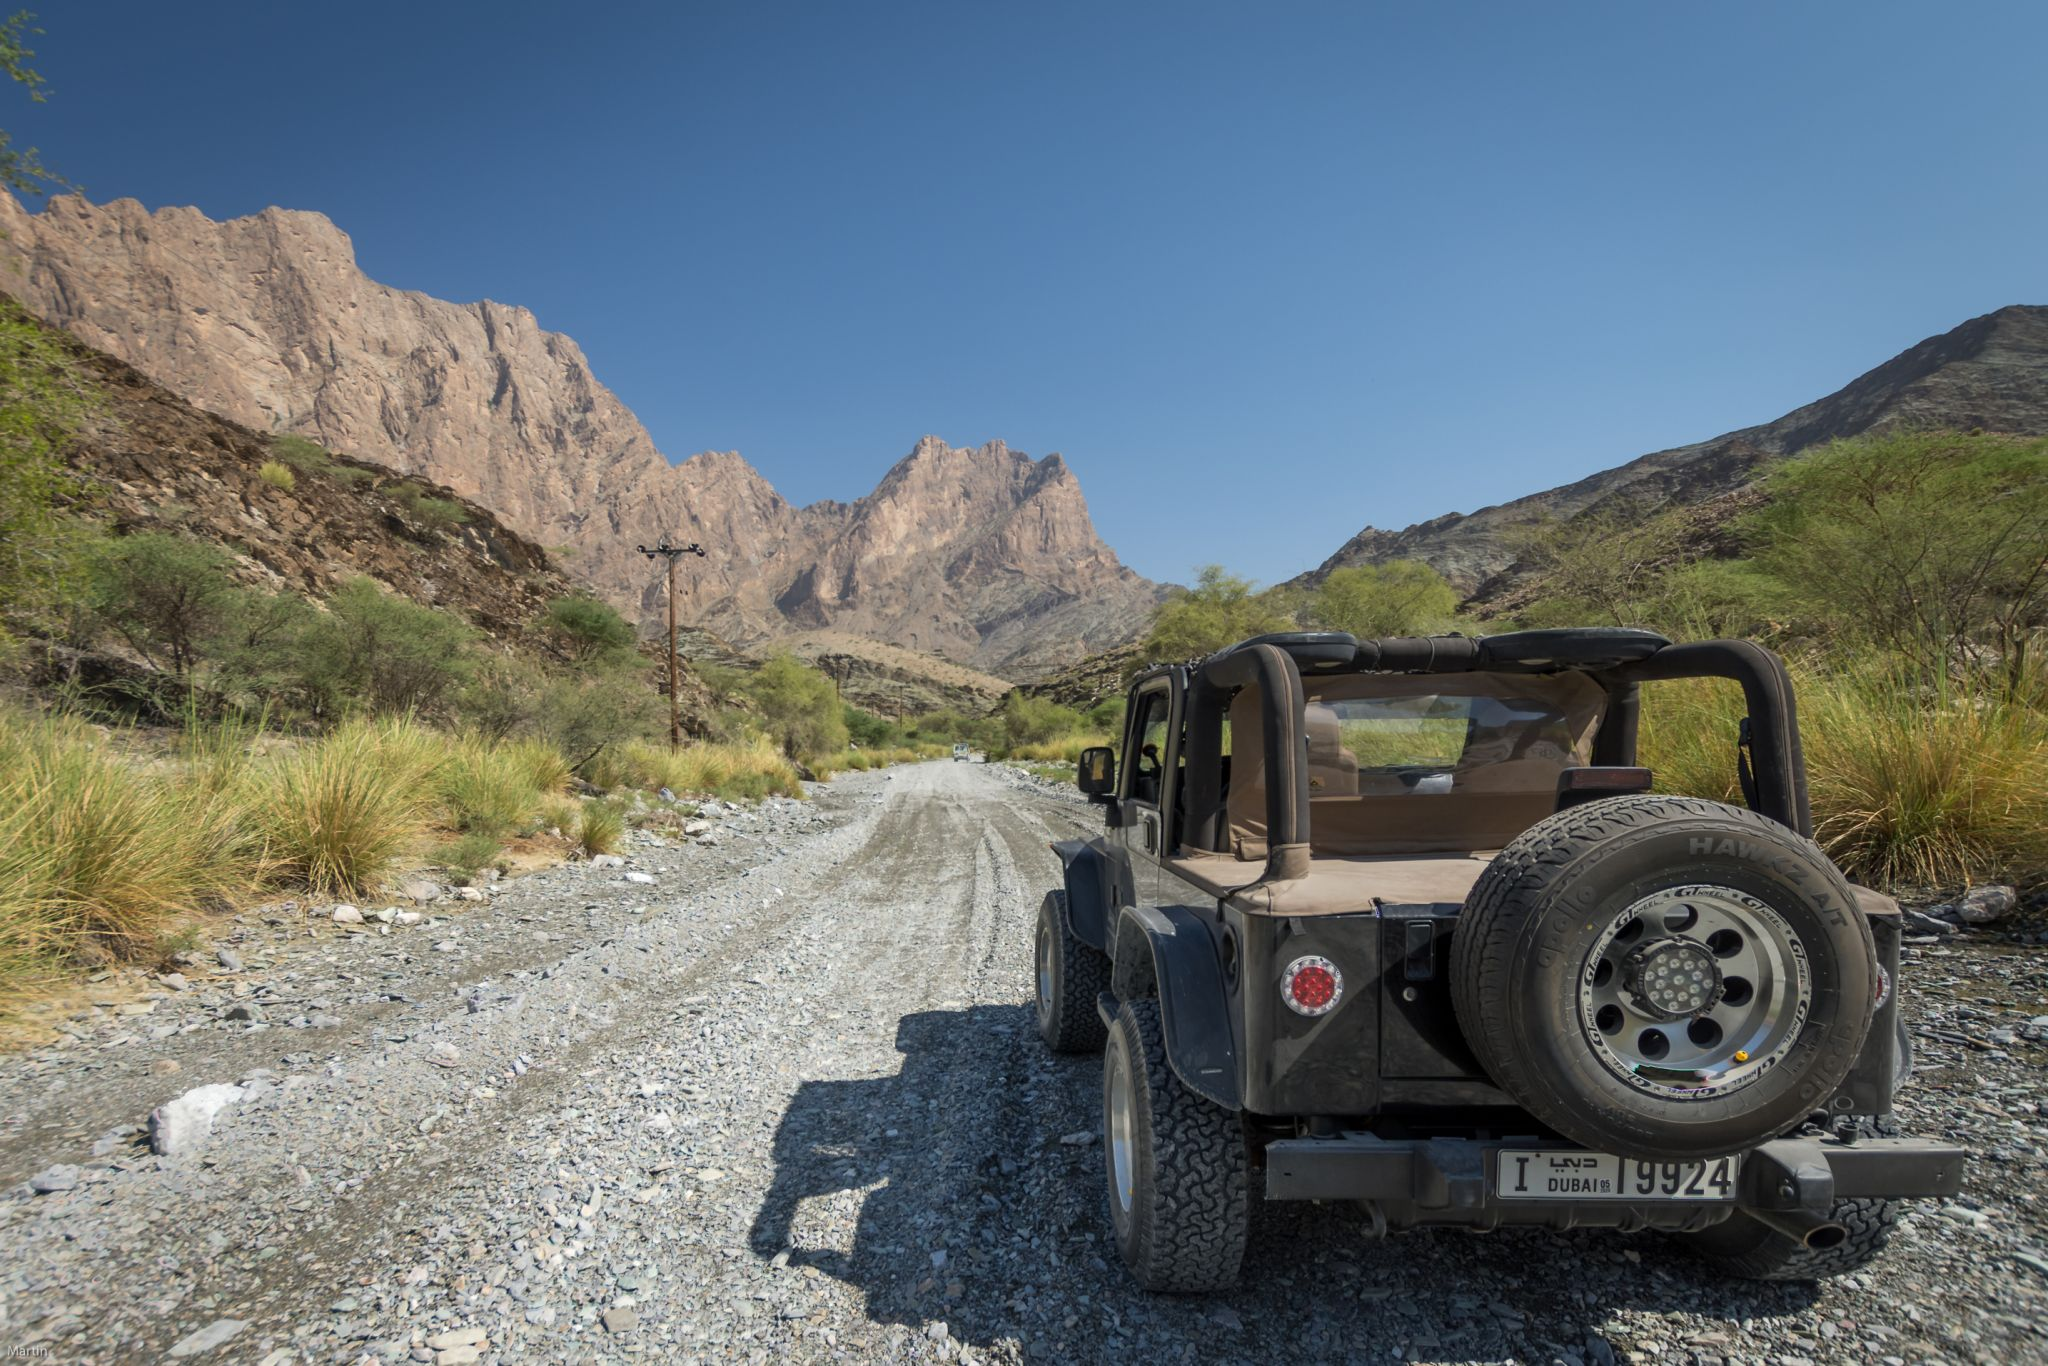 roads in the jebel shams, Oman